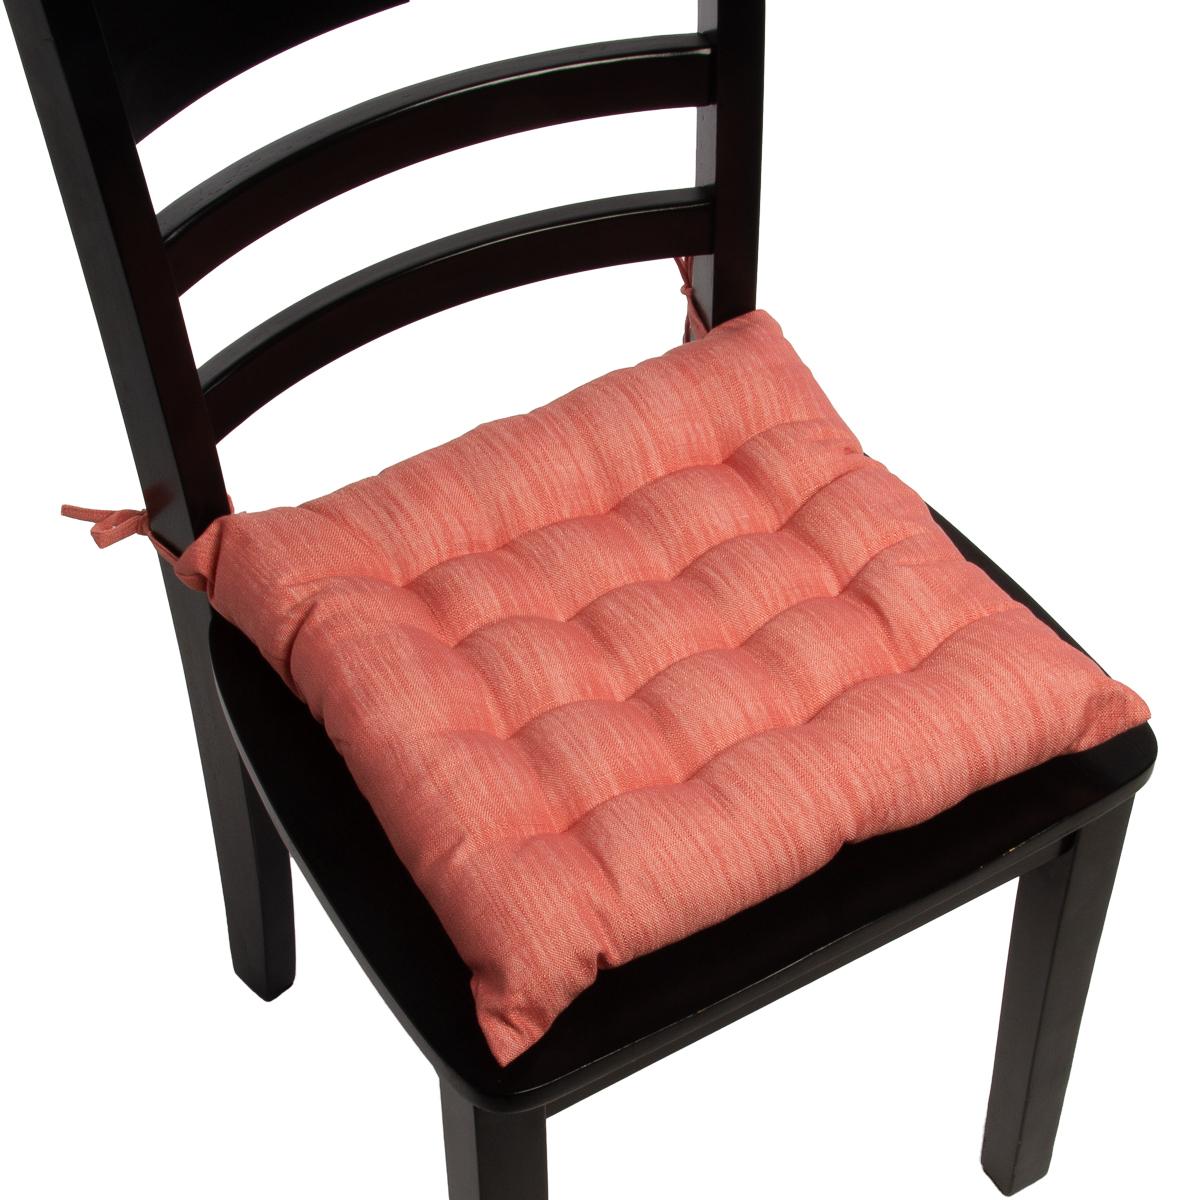 4pk Dream Home Chair Pads Square Tufted Cushion Seat